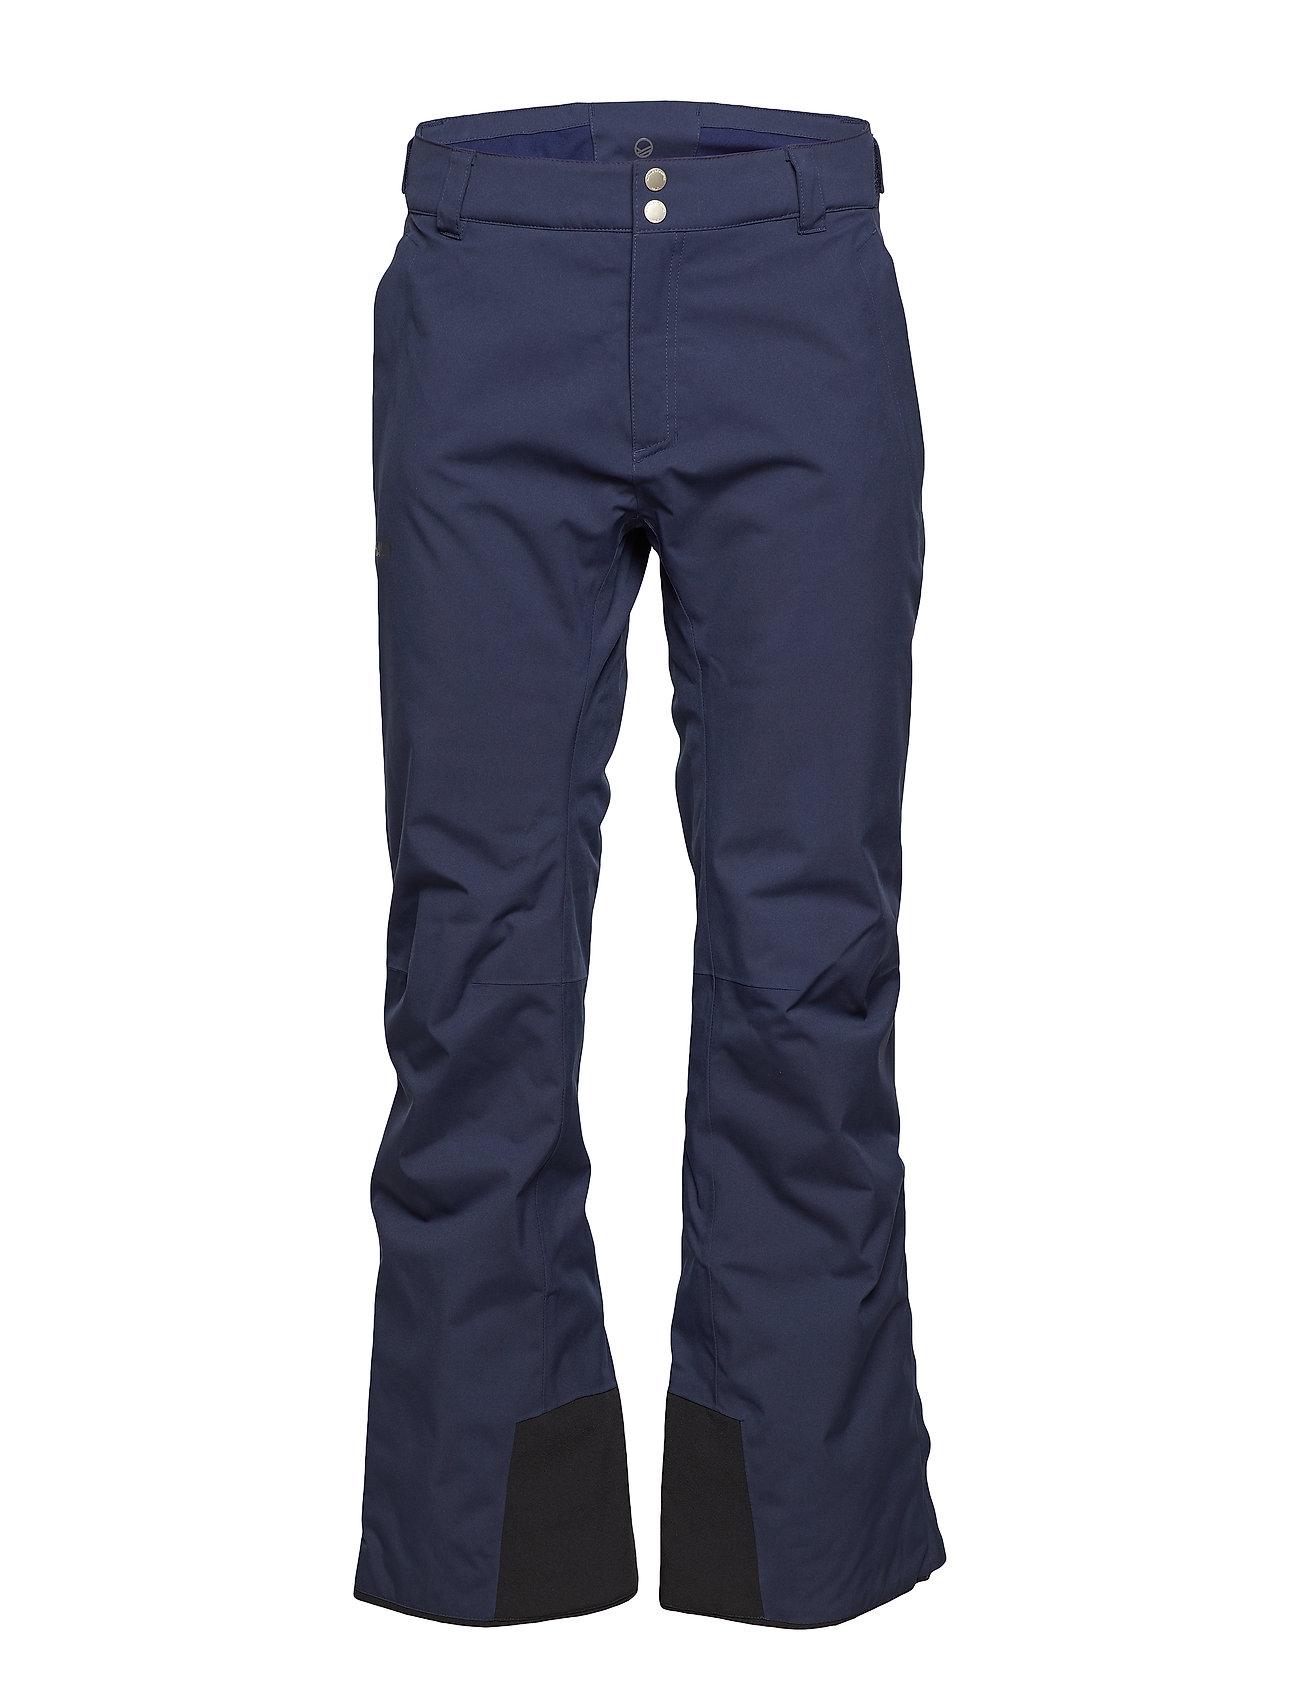 Halti Puntti II M DX ski pants